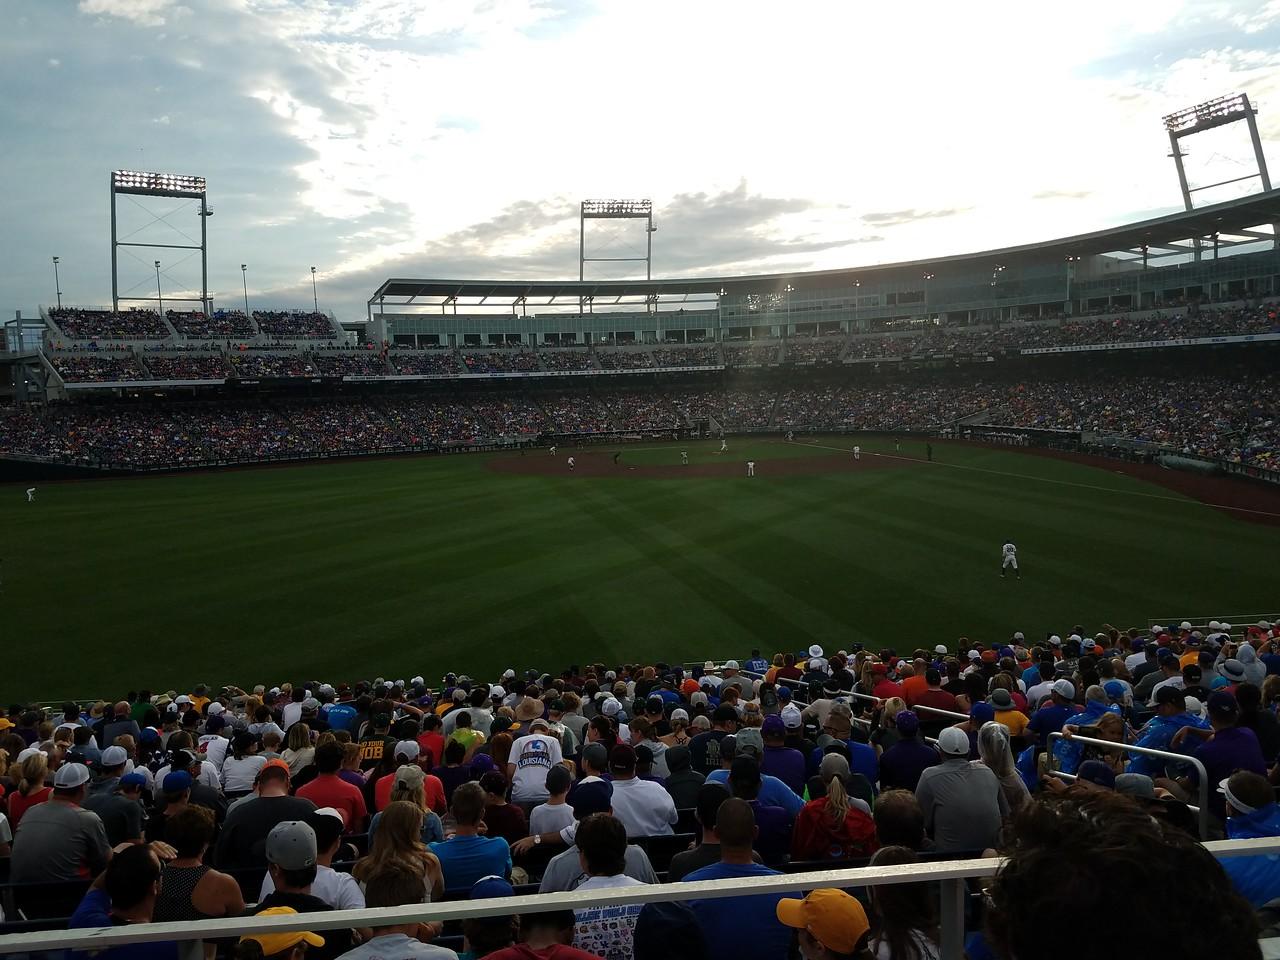 T.D. Ameritrade Park - 2017 College World Series